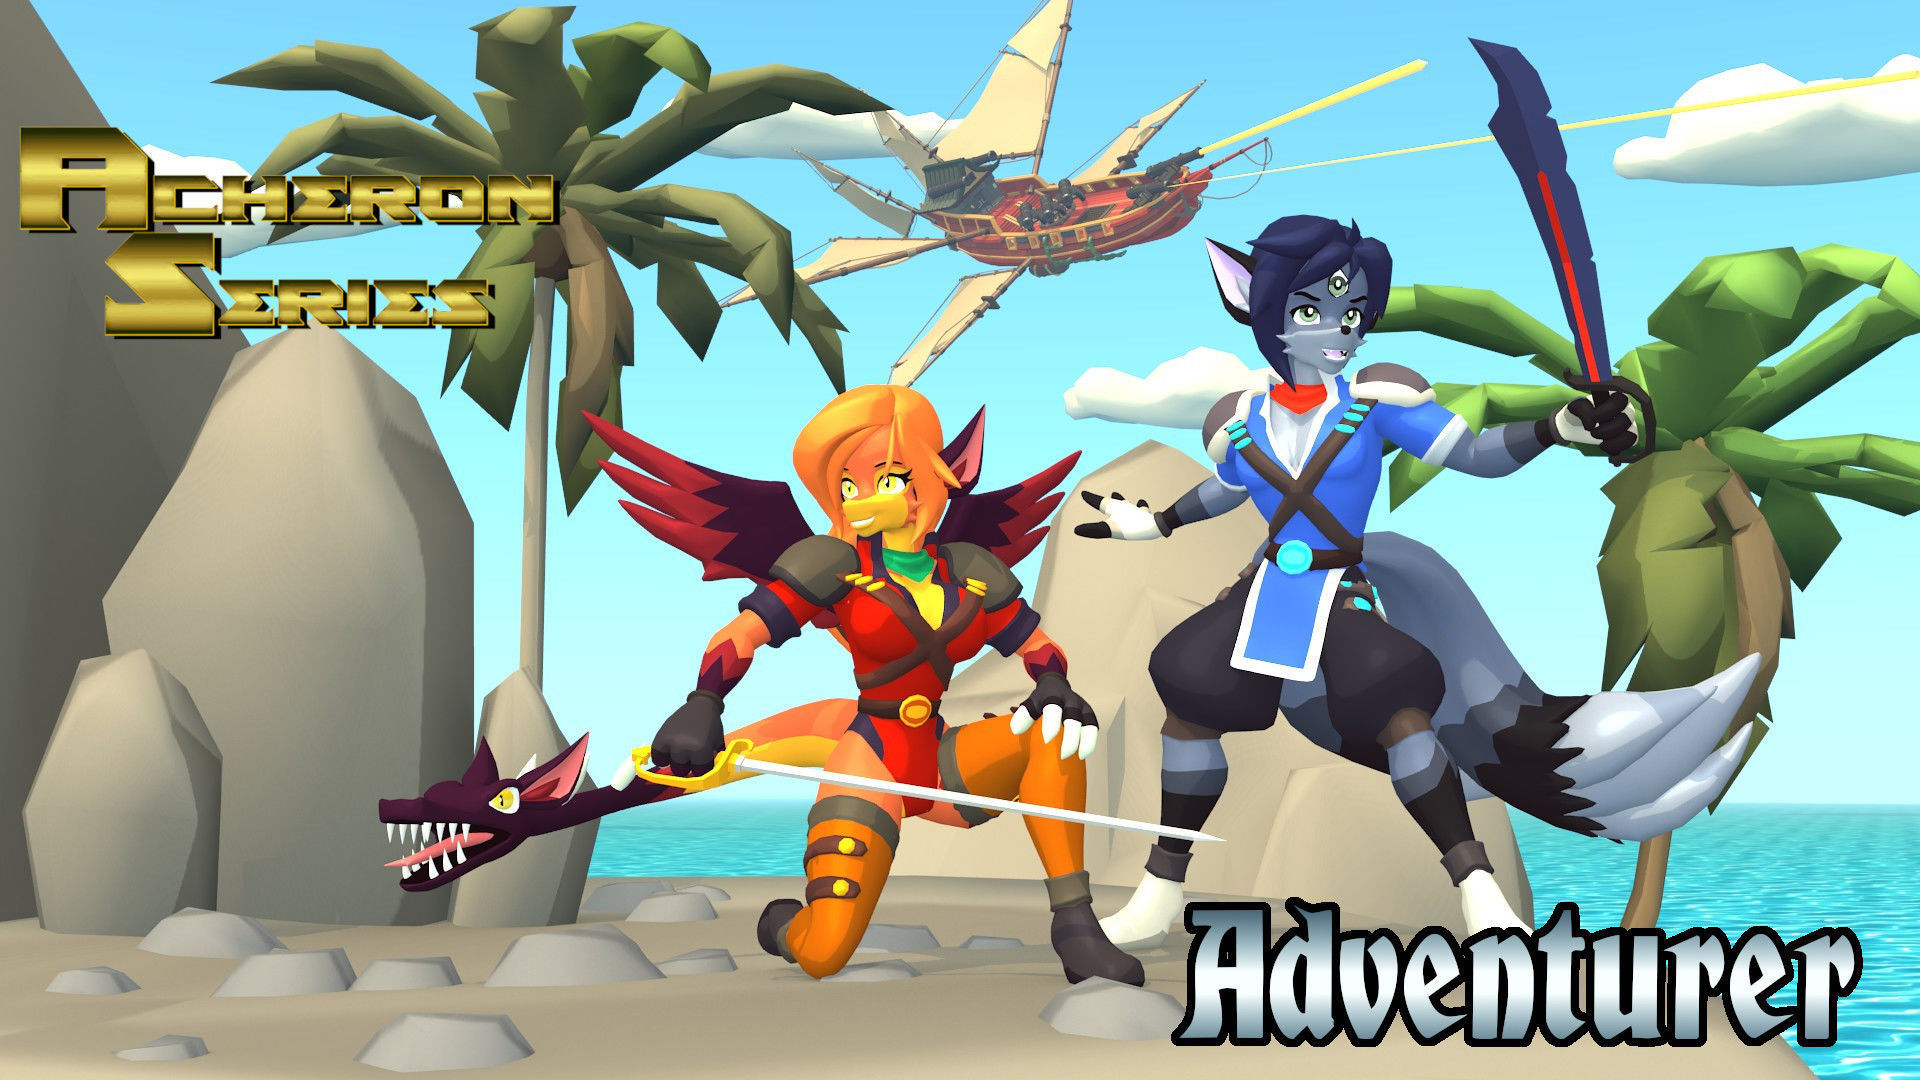 Acheron Adventurer Outfit